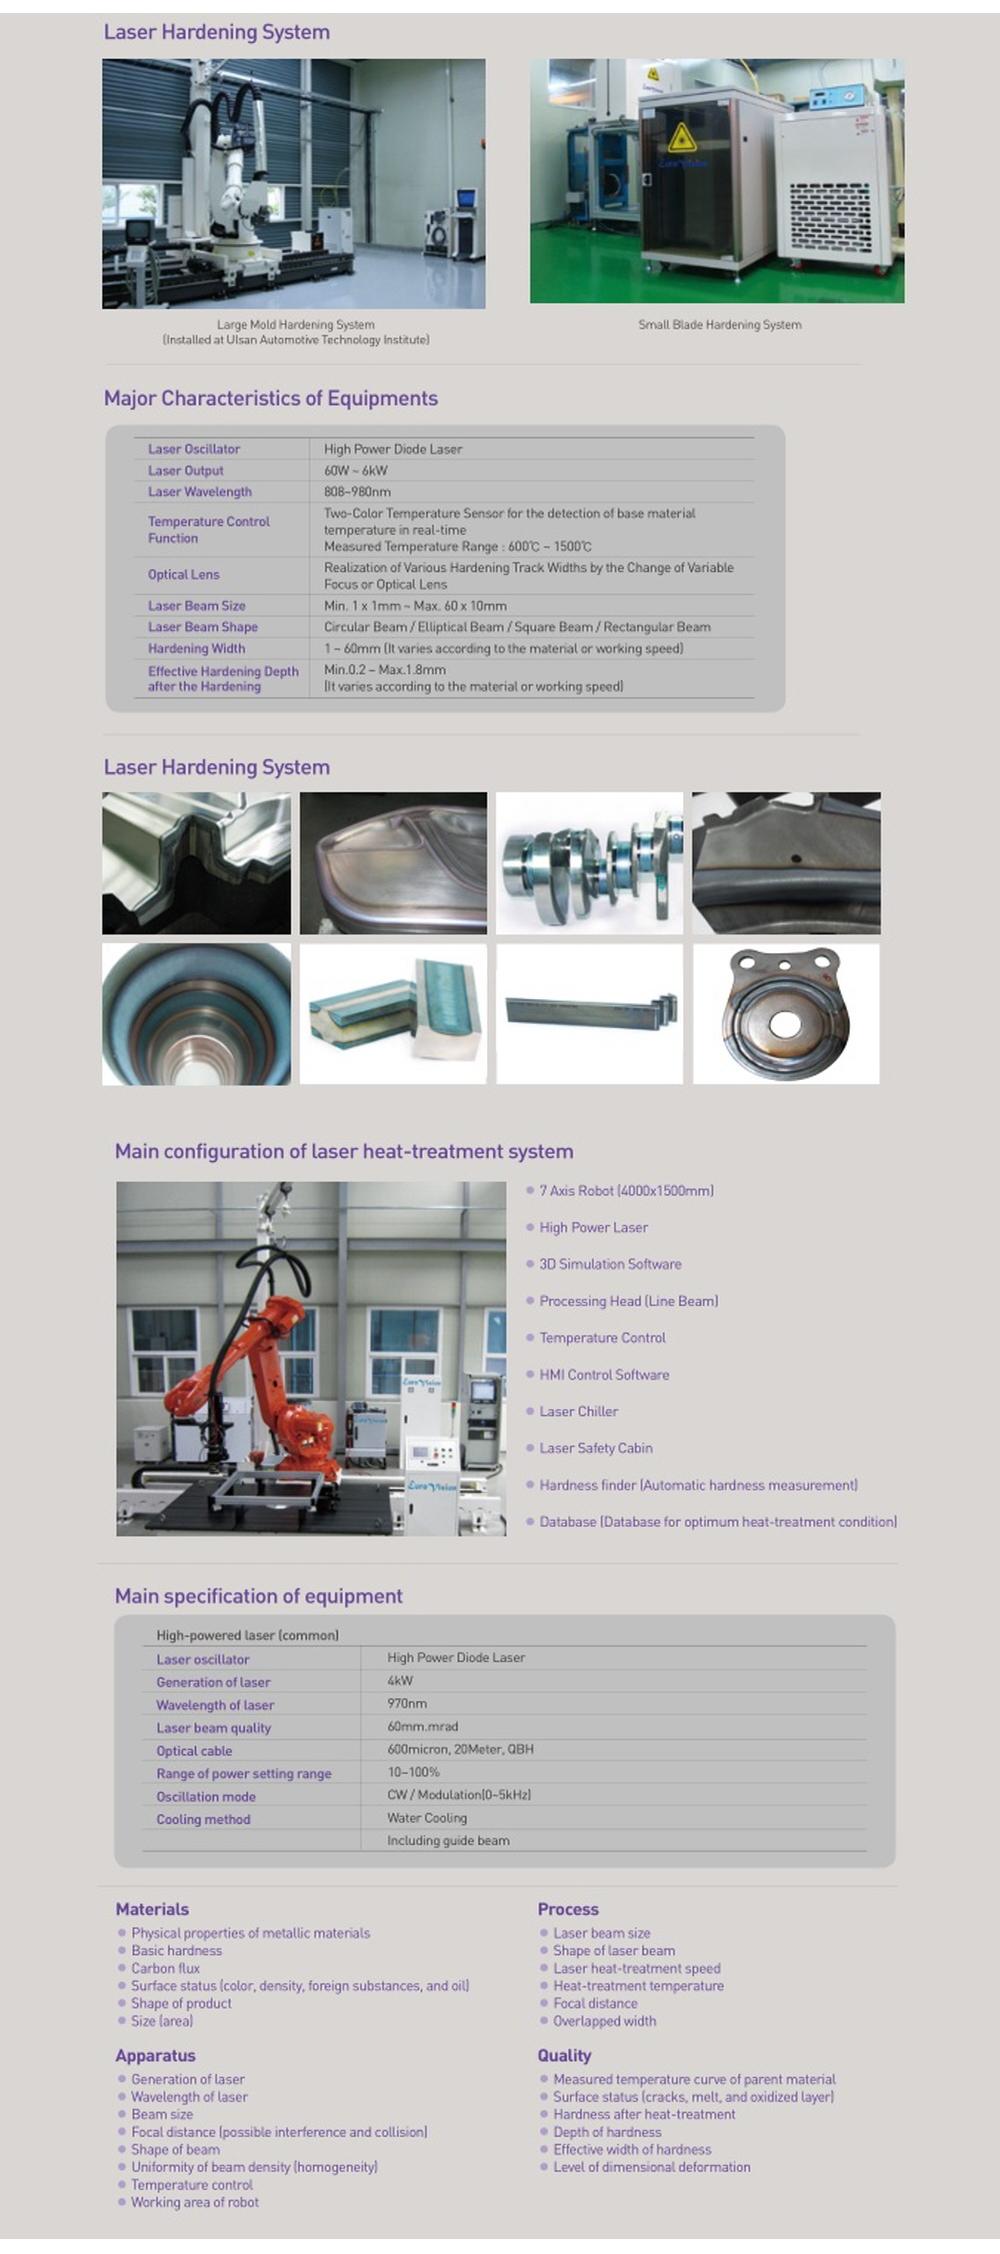 Euro Vision Laser Laser Hardening M/C